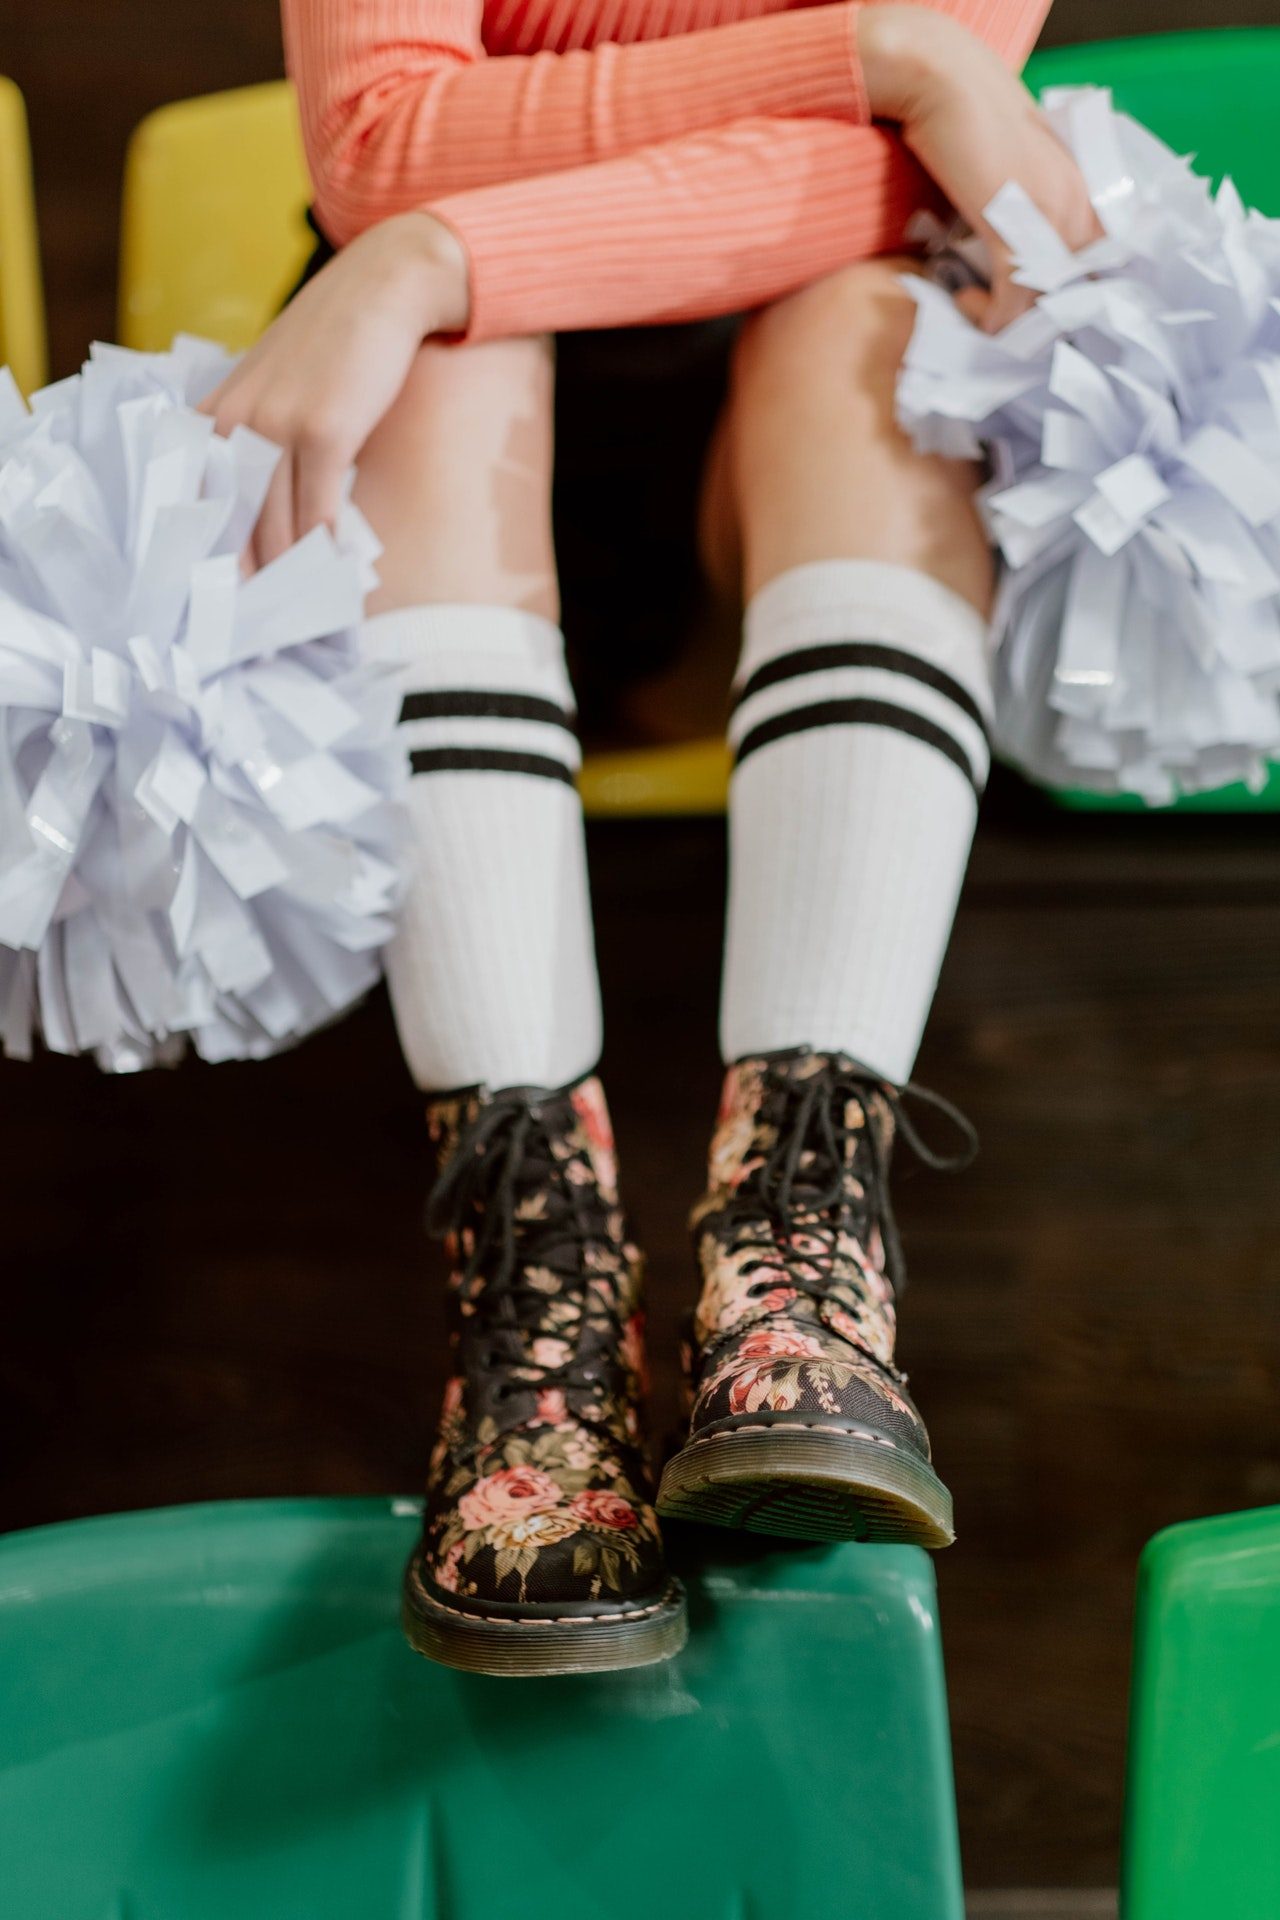 Knee High Socks Article Image